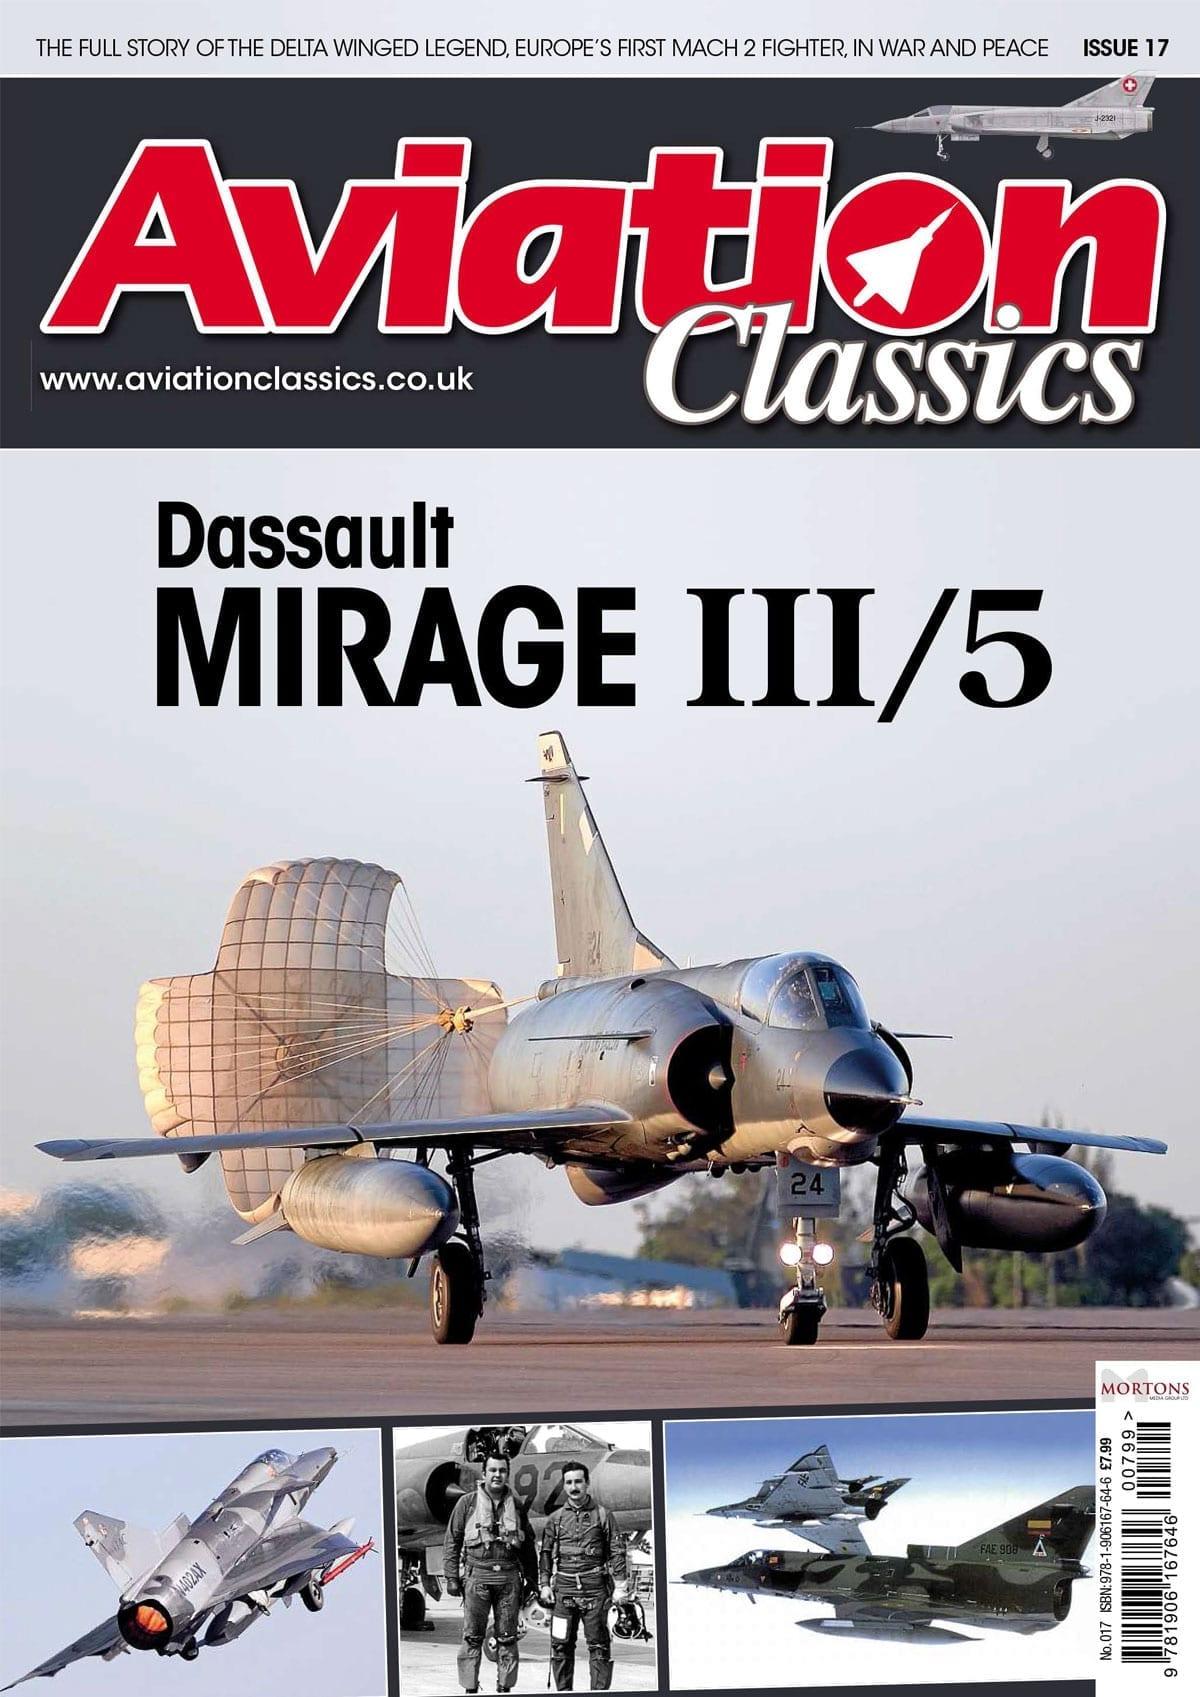 Aviation Classics – Dassault Mirage III/5